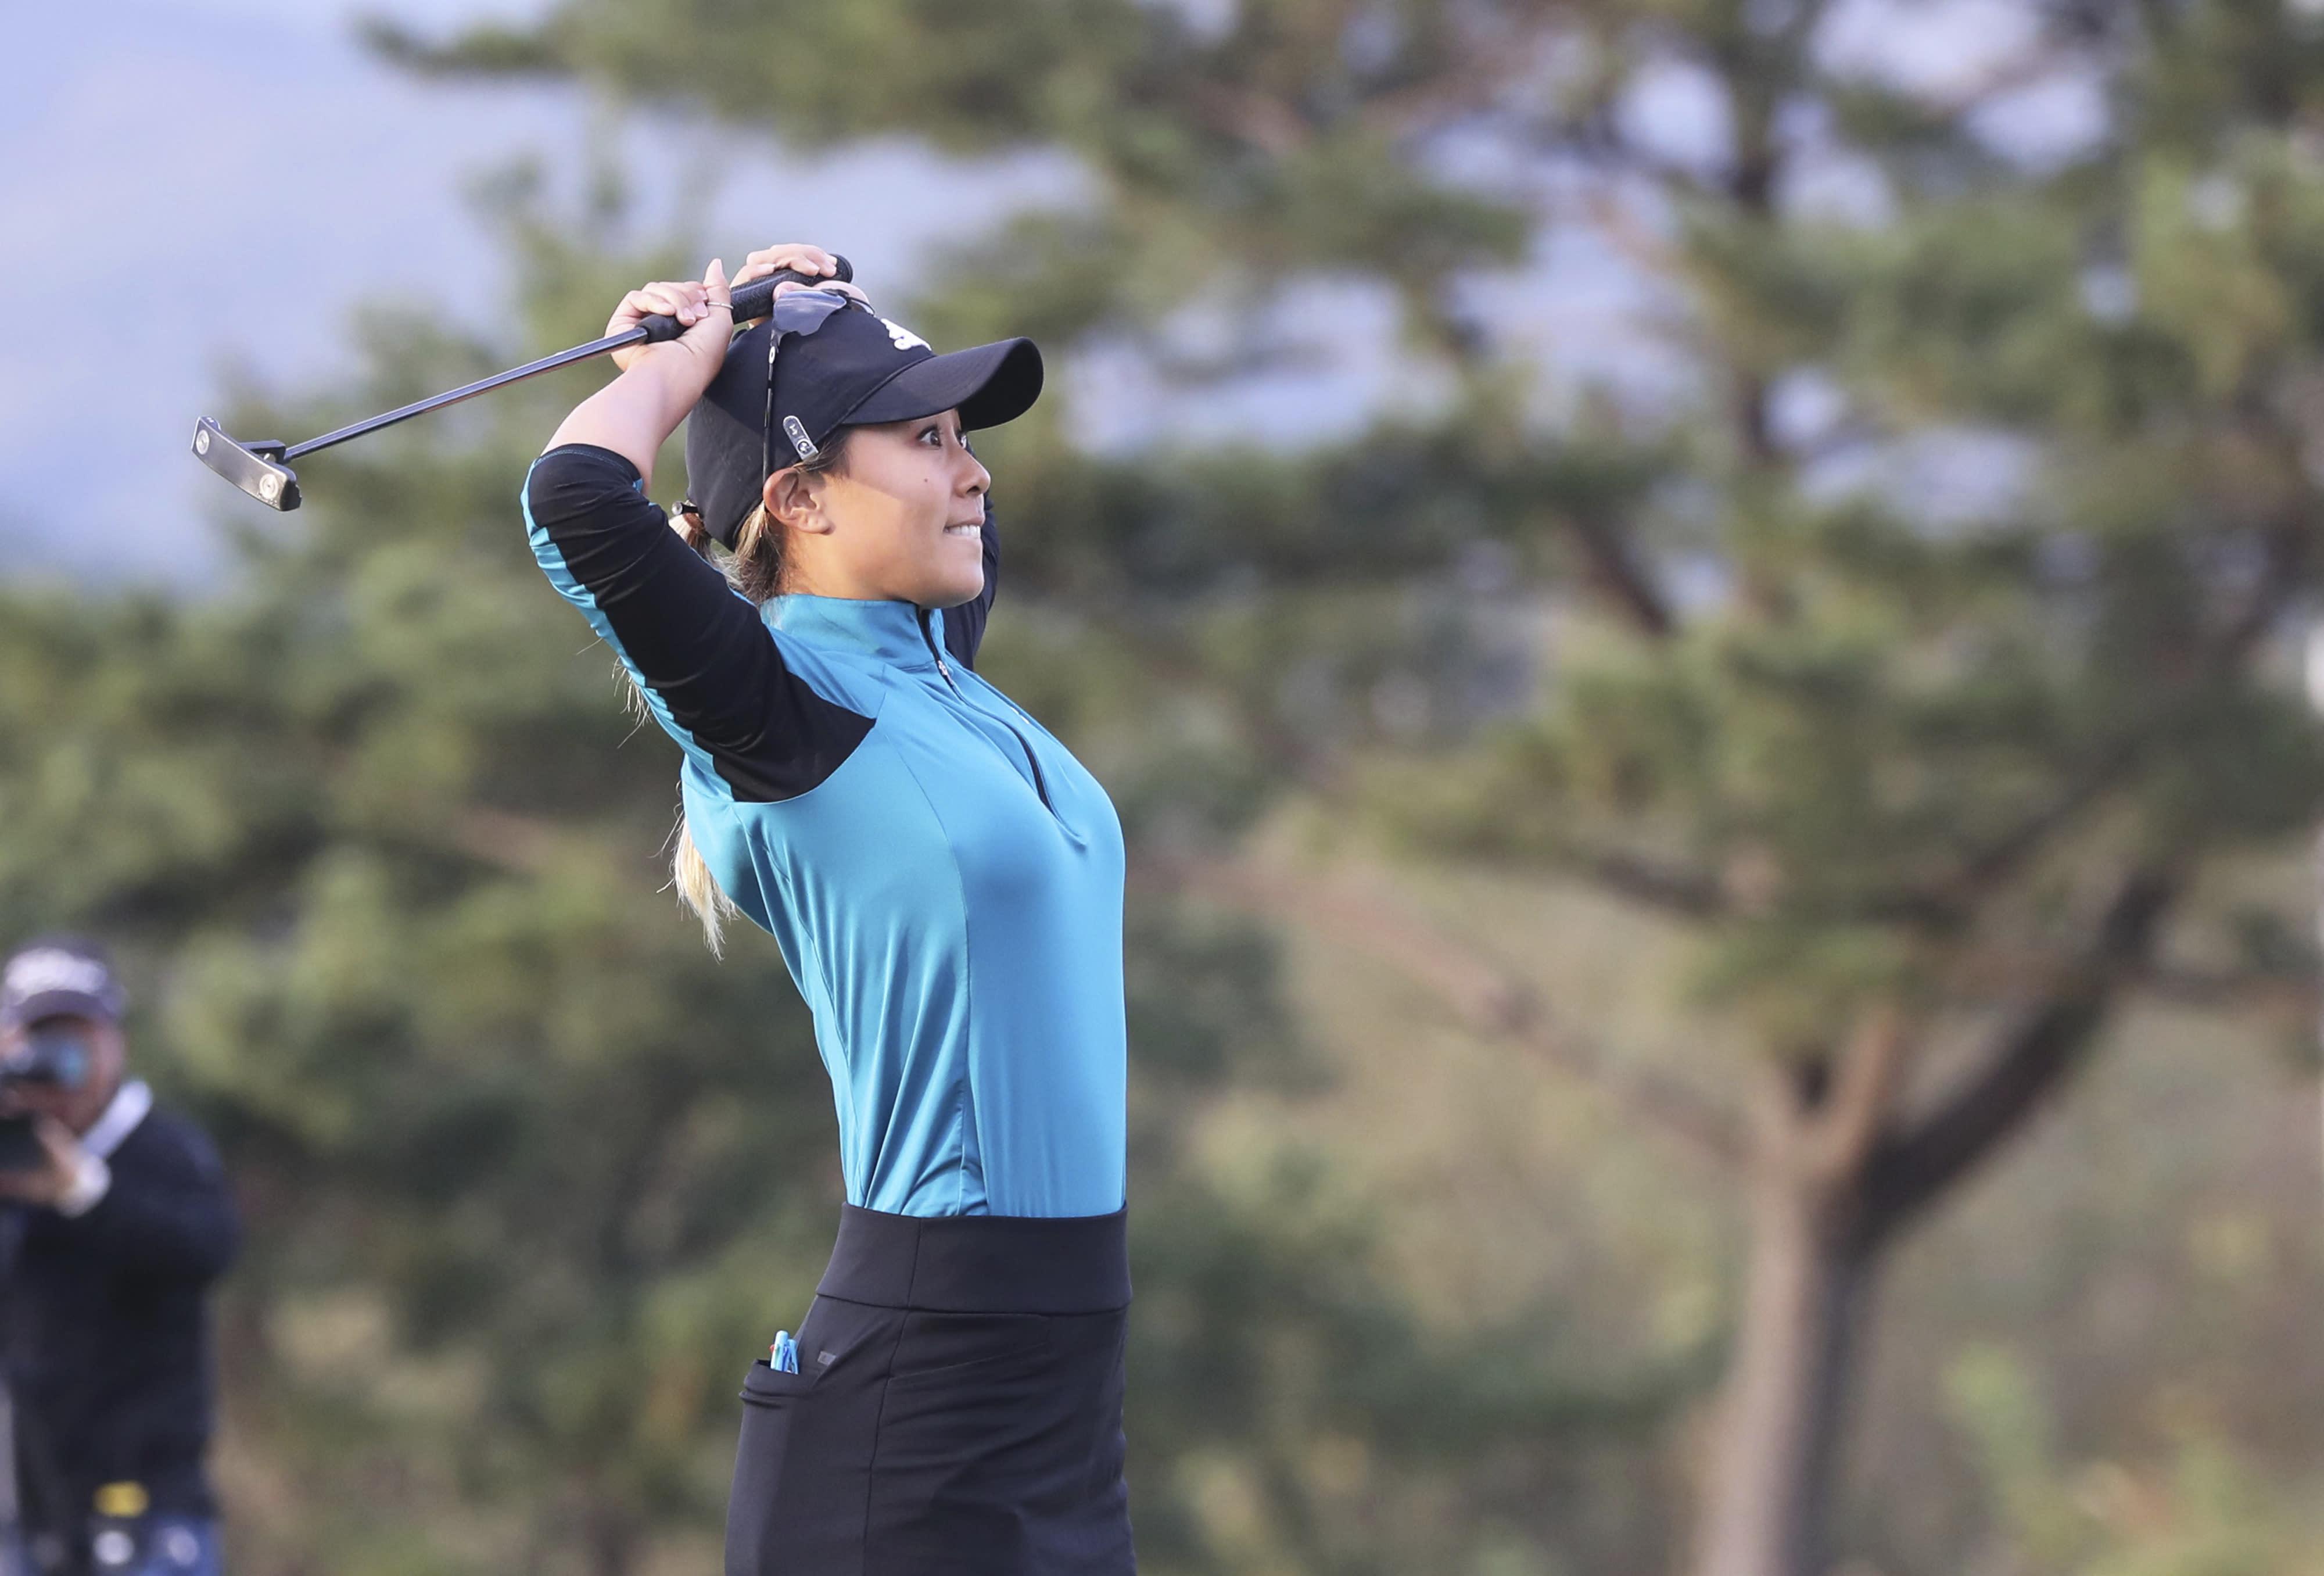 Jang beats Kang in LPGA playoff in South Korea